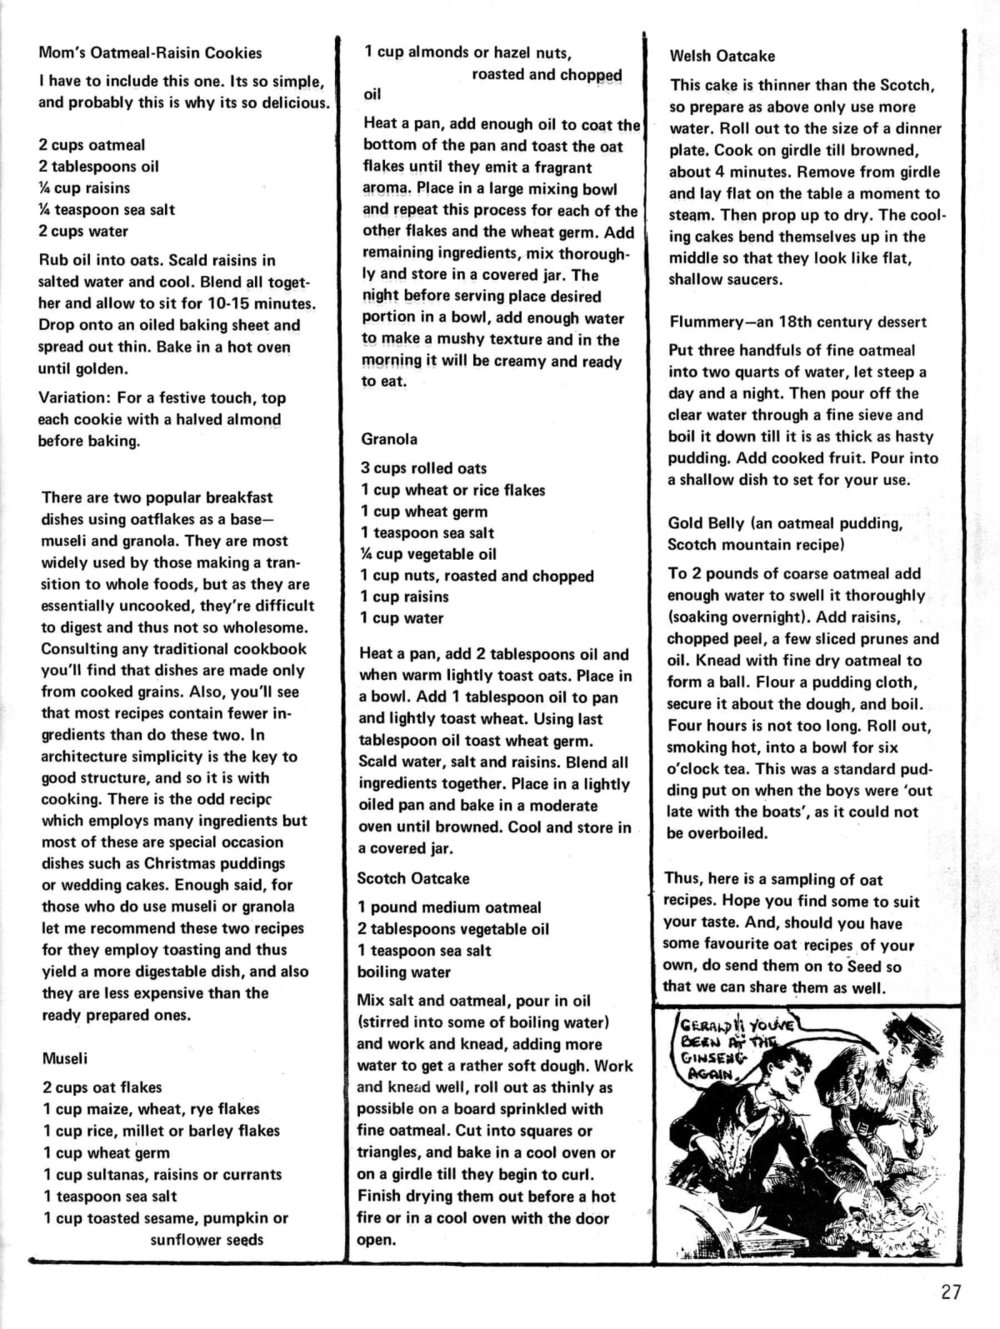 seed-v2-n4-april1973-27.jpg